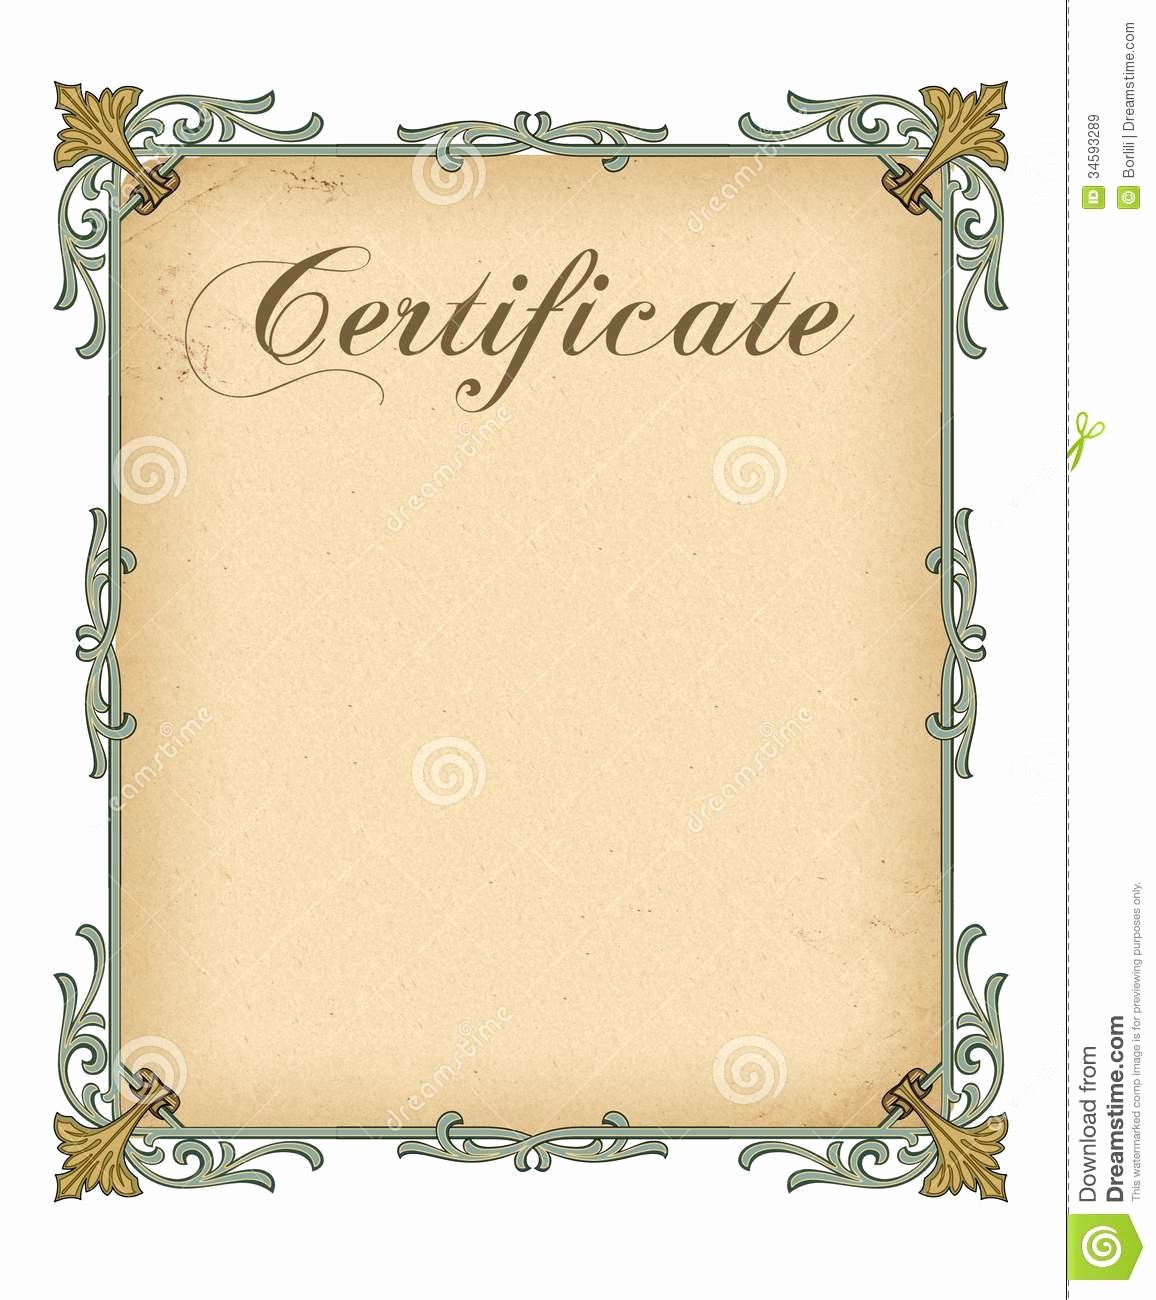 Certificate Design Templates Free Download Fresh Blank Certificate Template Free Download Templates Data